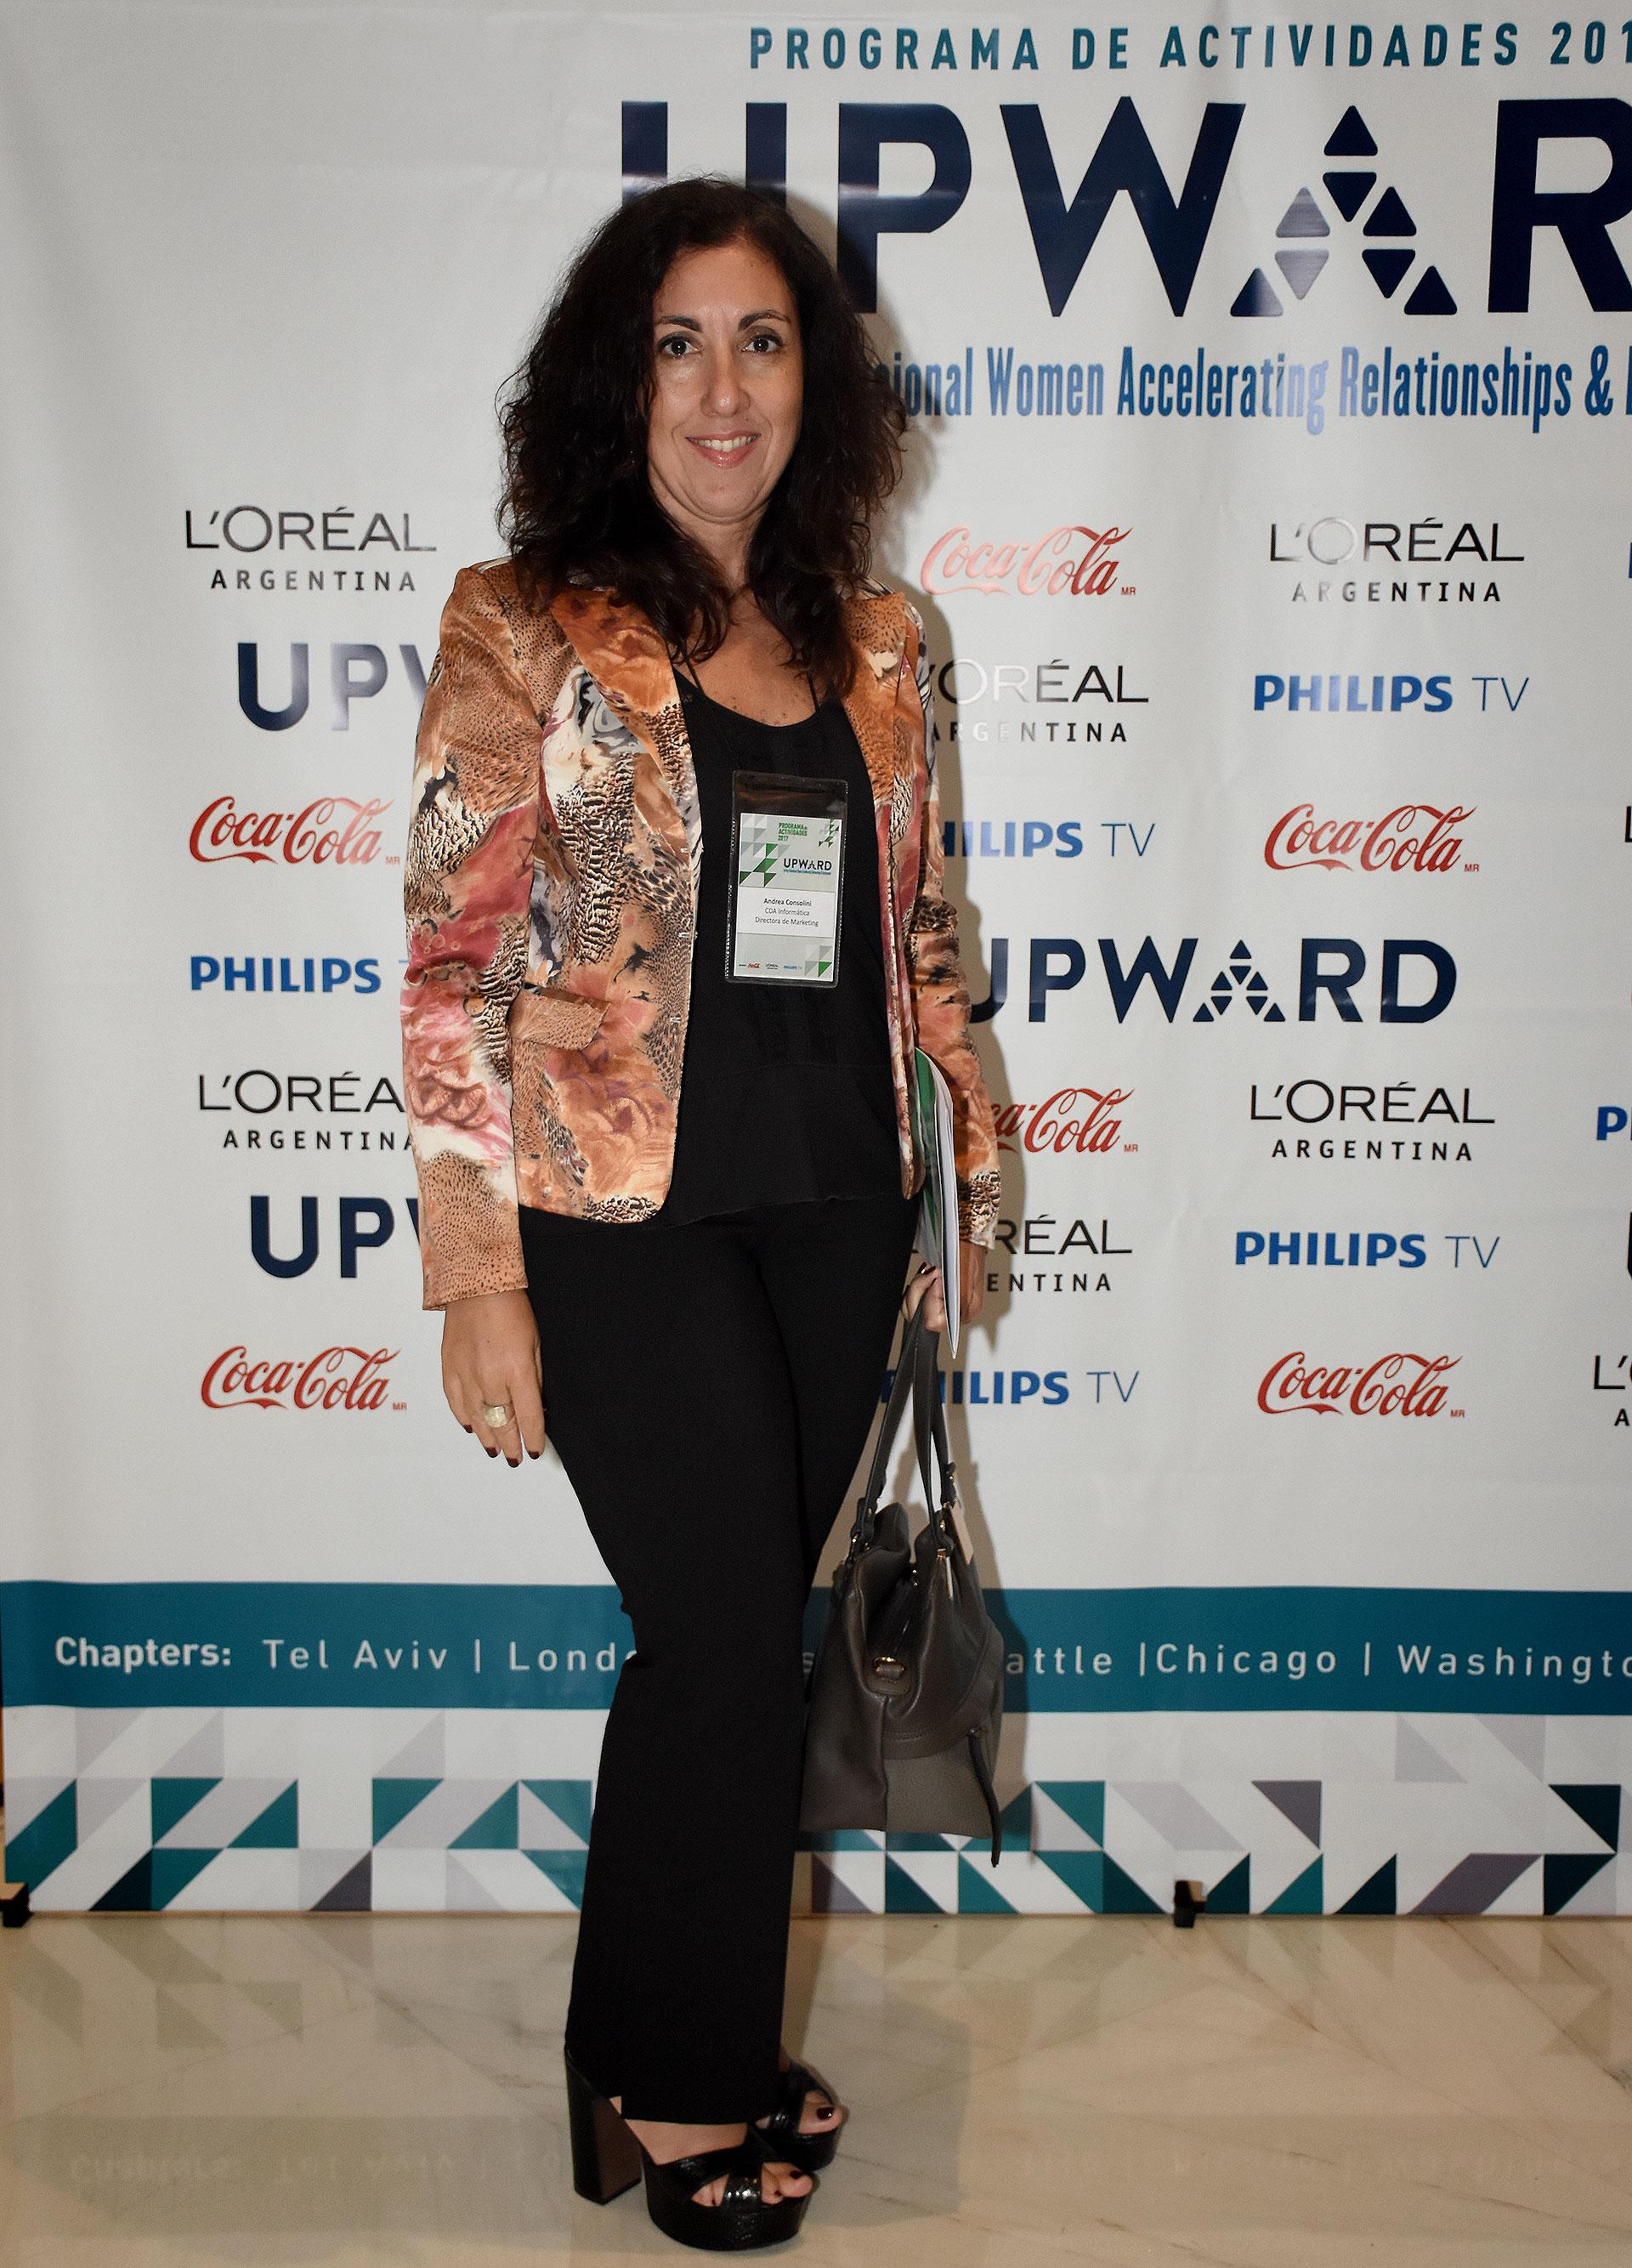 Andrea Consolini (CDA Informática)